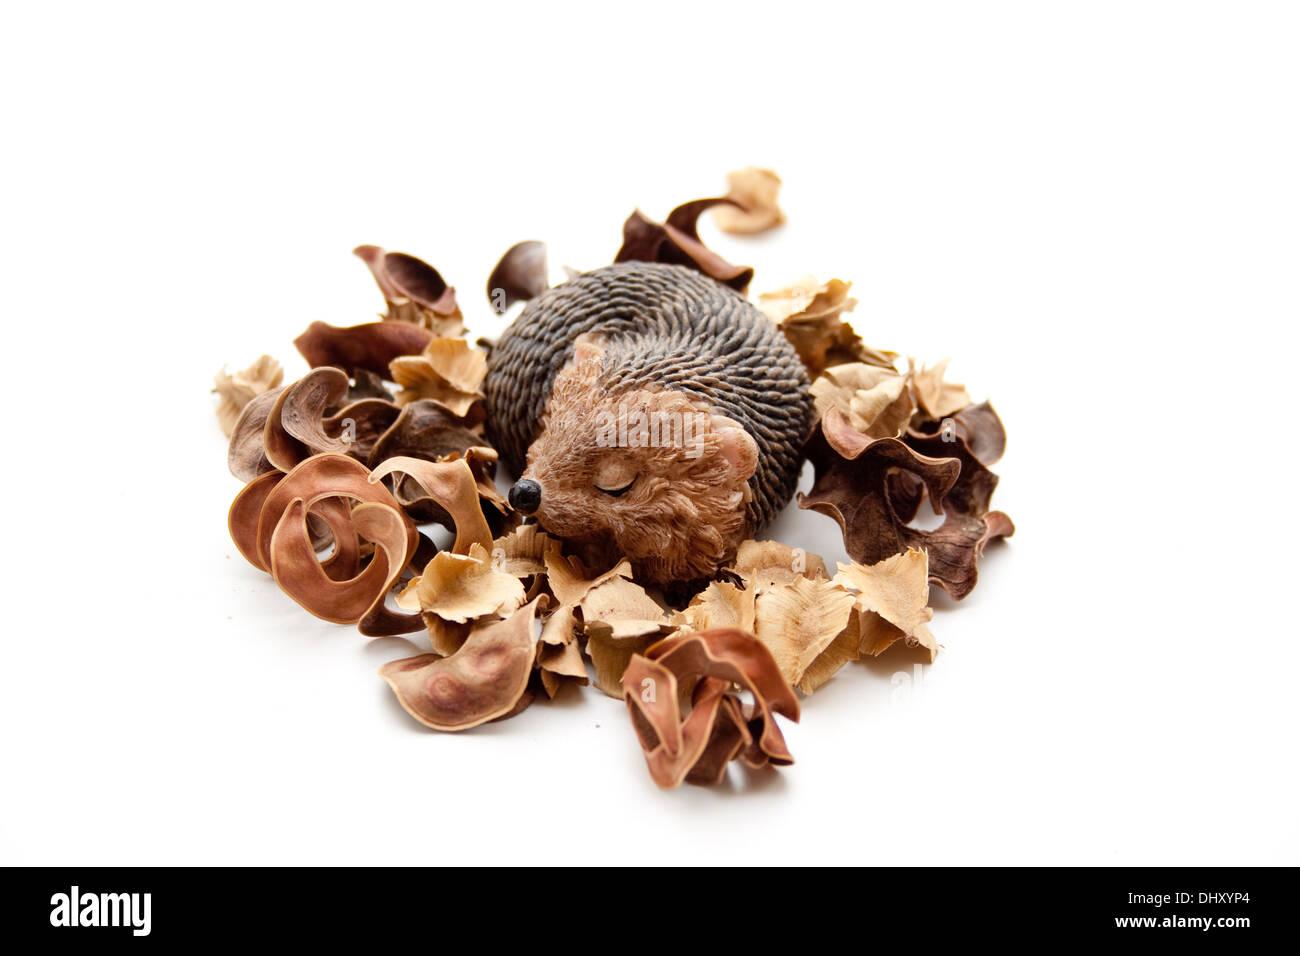 Hedgehog figure with potpourri - Stock Image